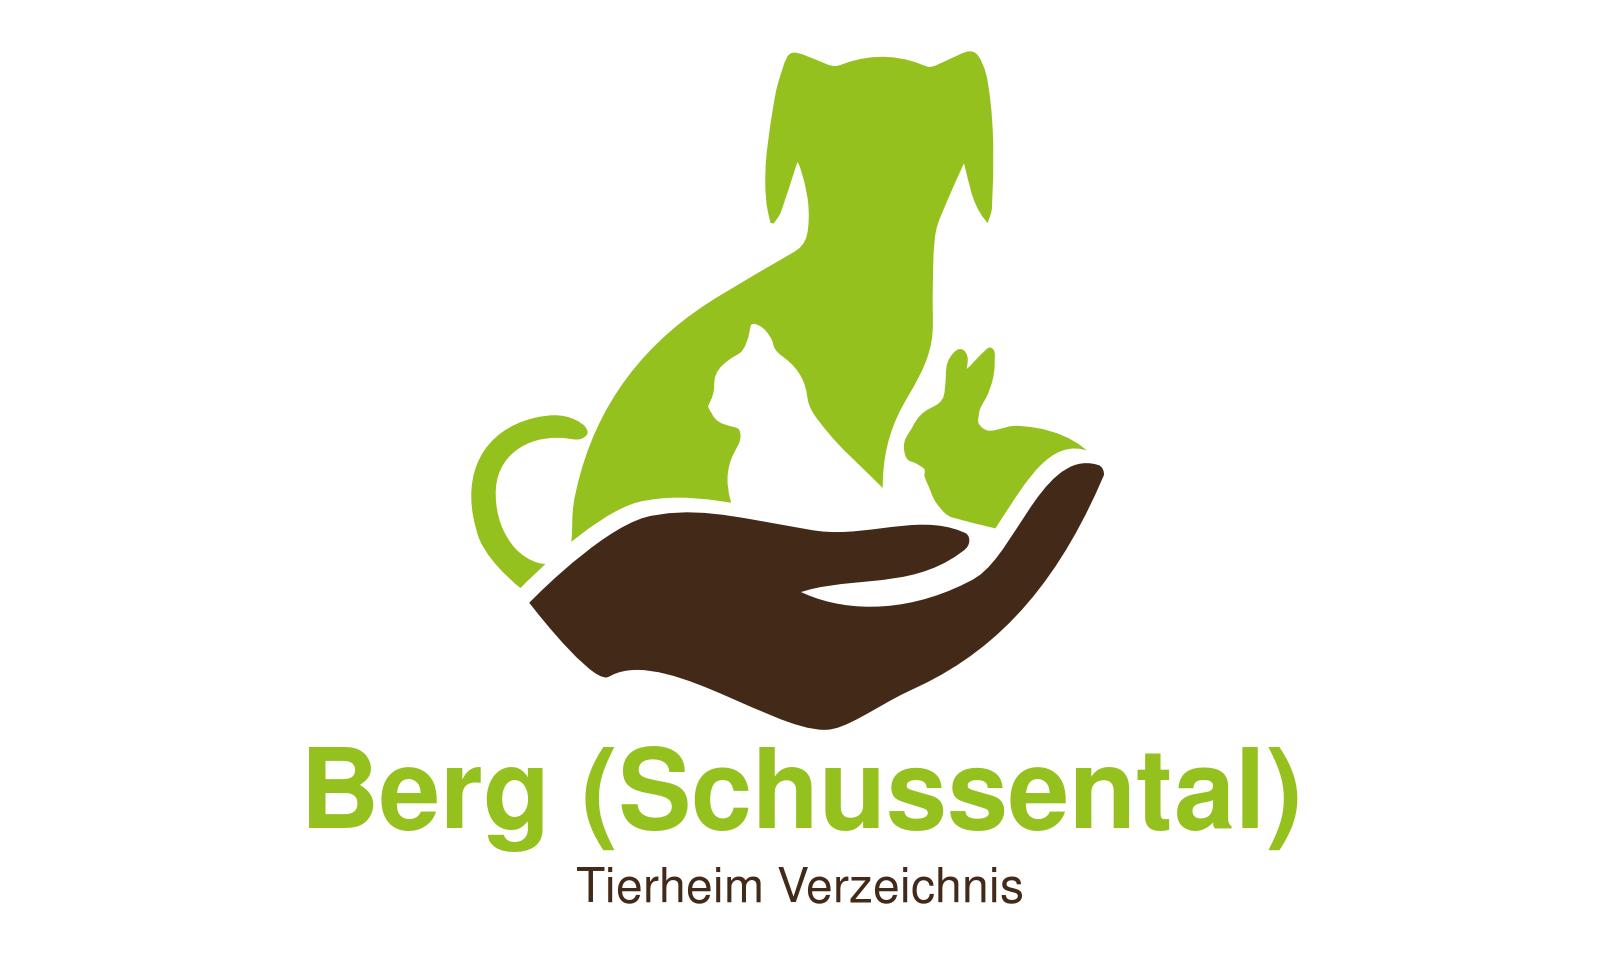 Tierheim Berg (Schussental)